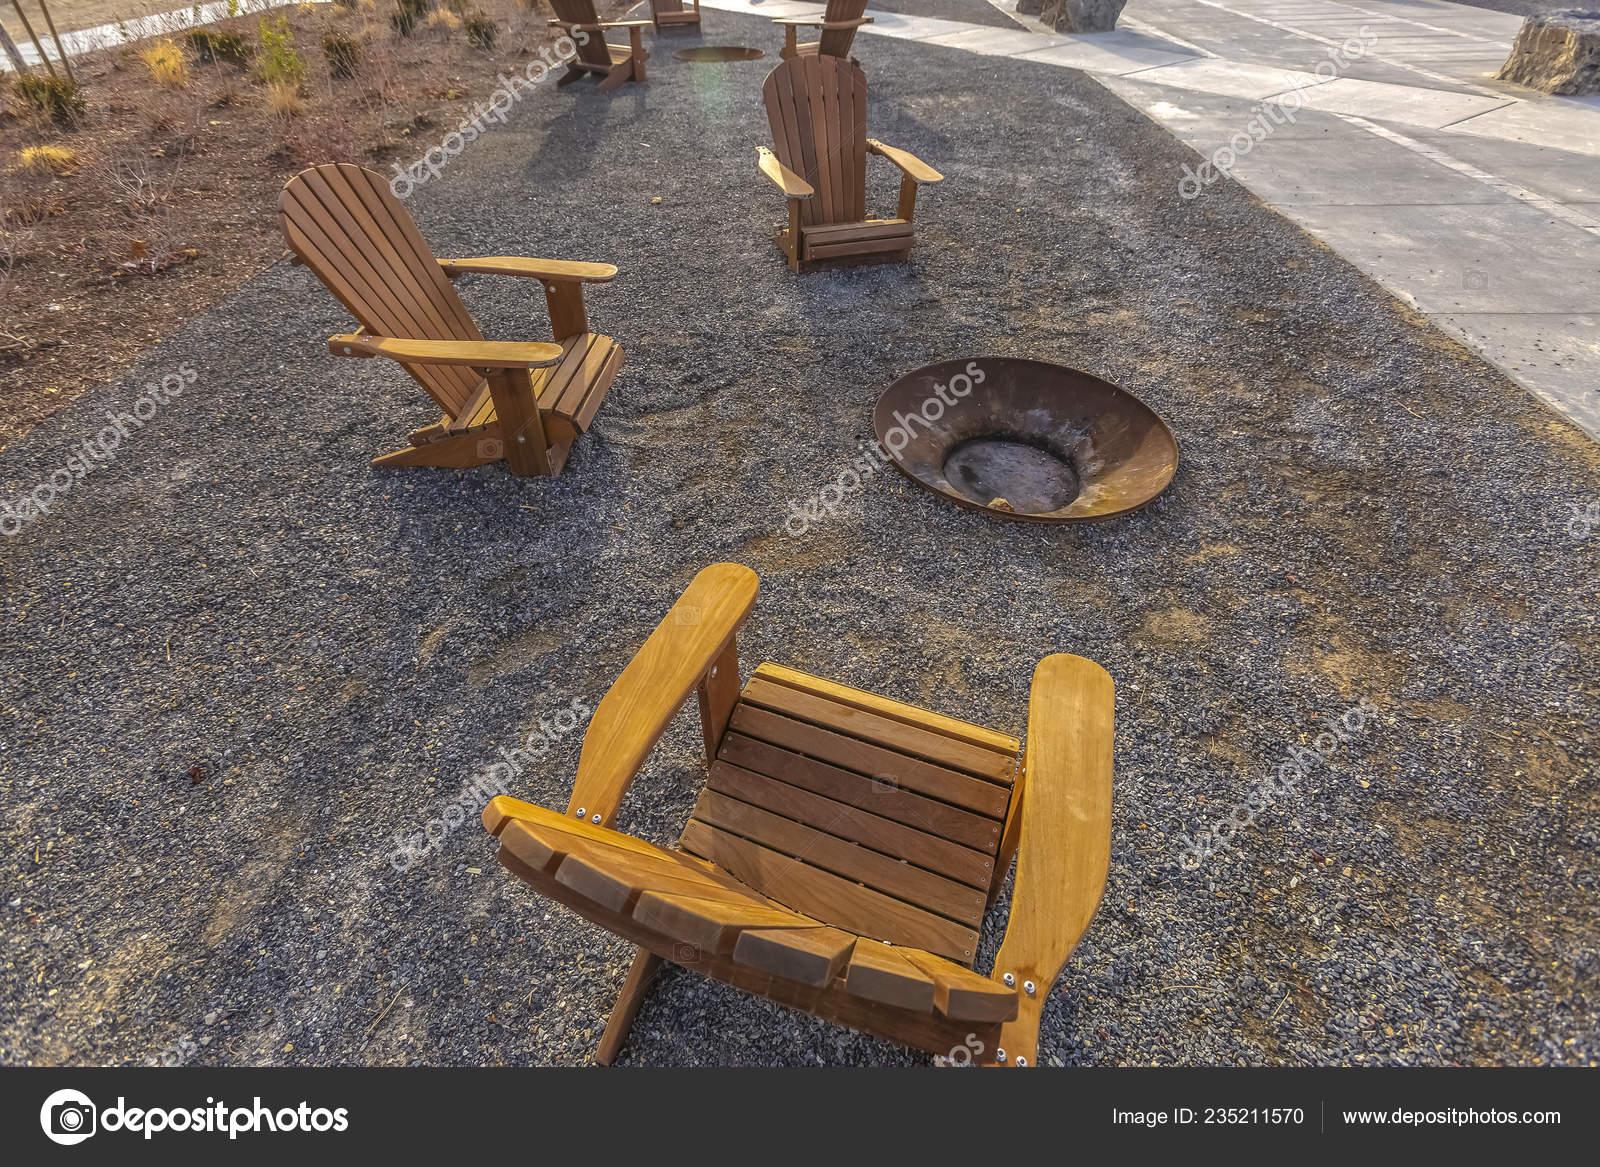 Sensational Wooden Chairs Sitting Around A Fire Pit In Park Stock Machost Co Dining Chair Design Ideas Machostcouk